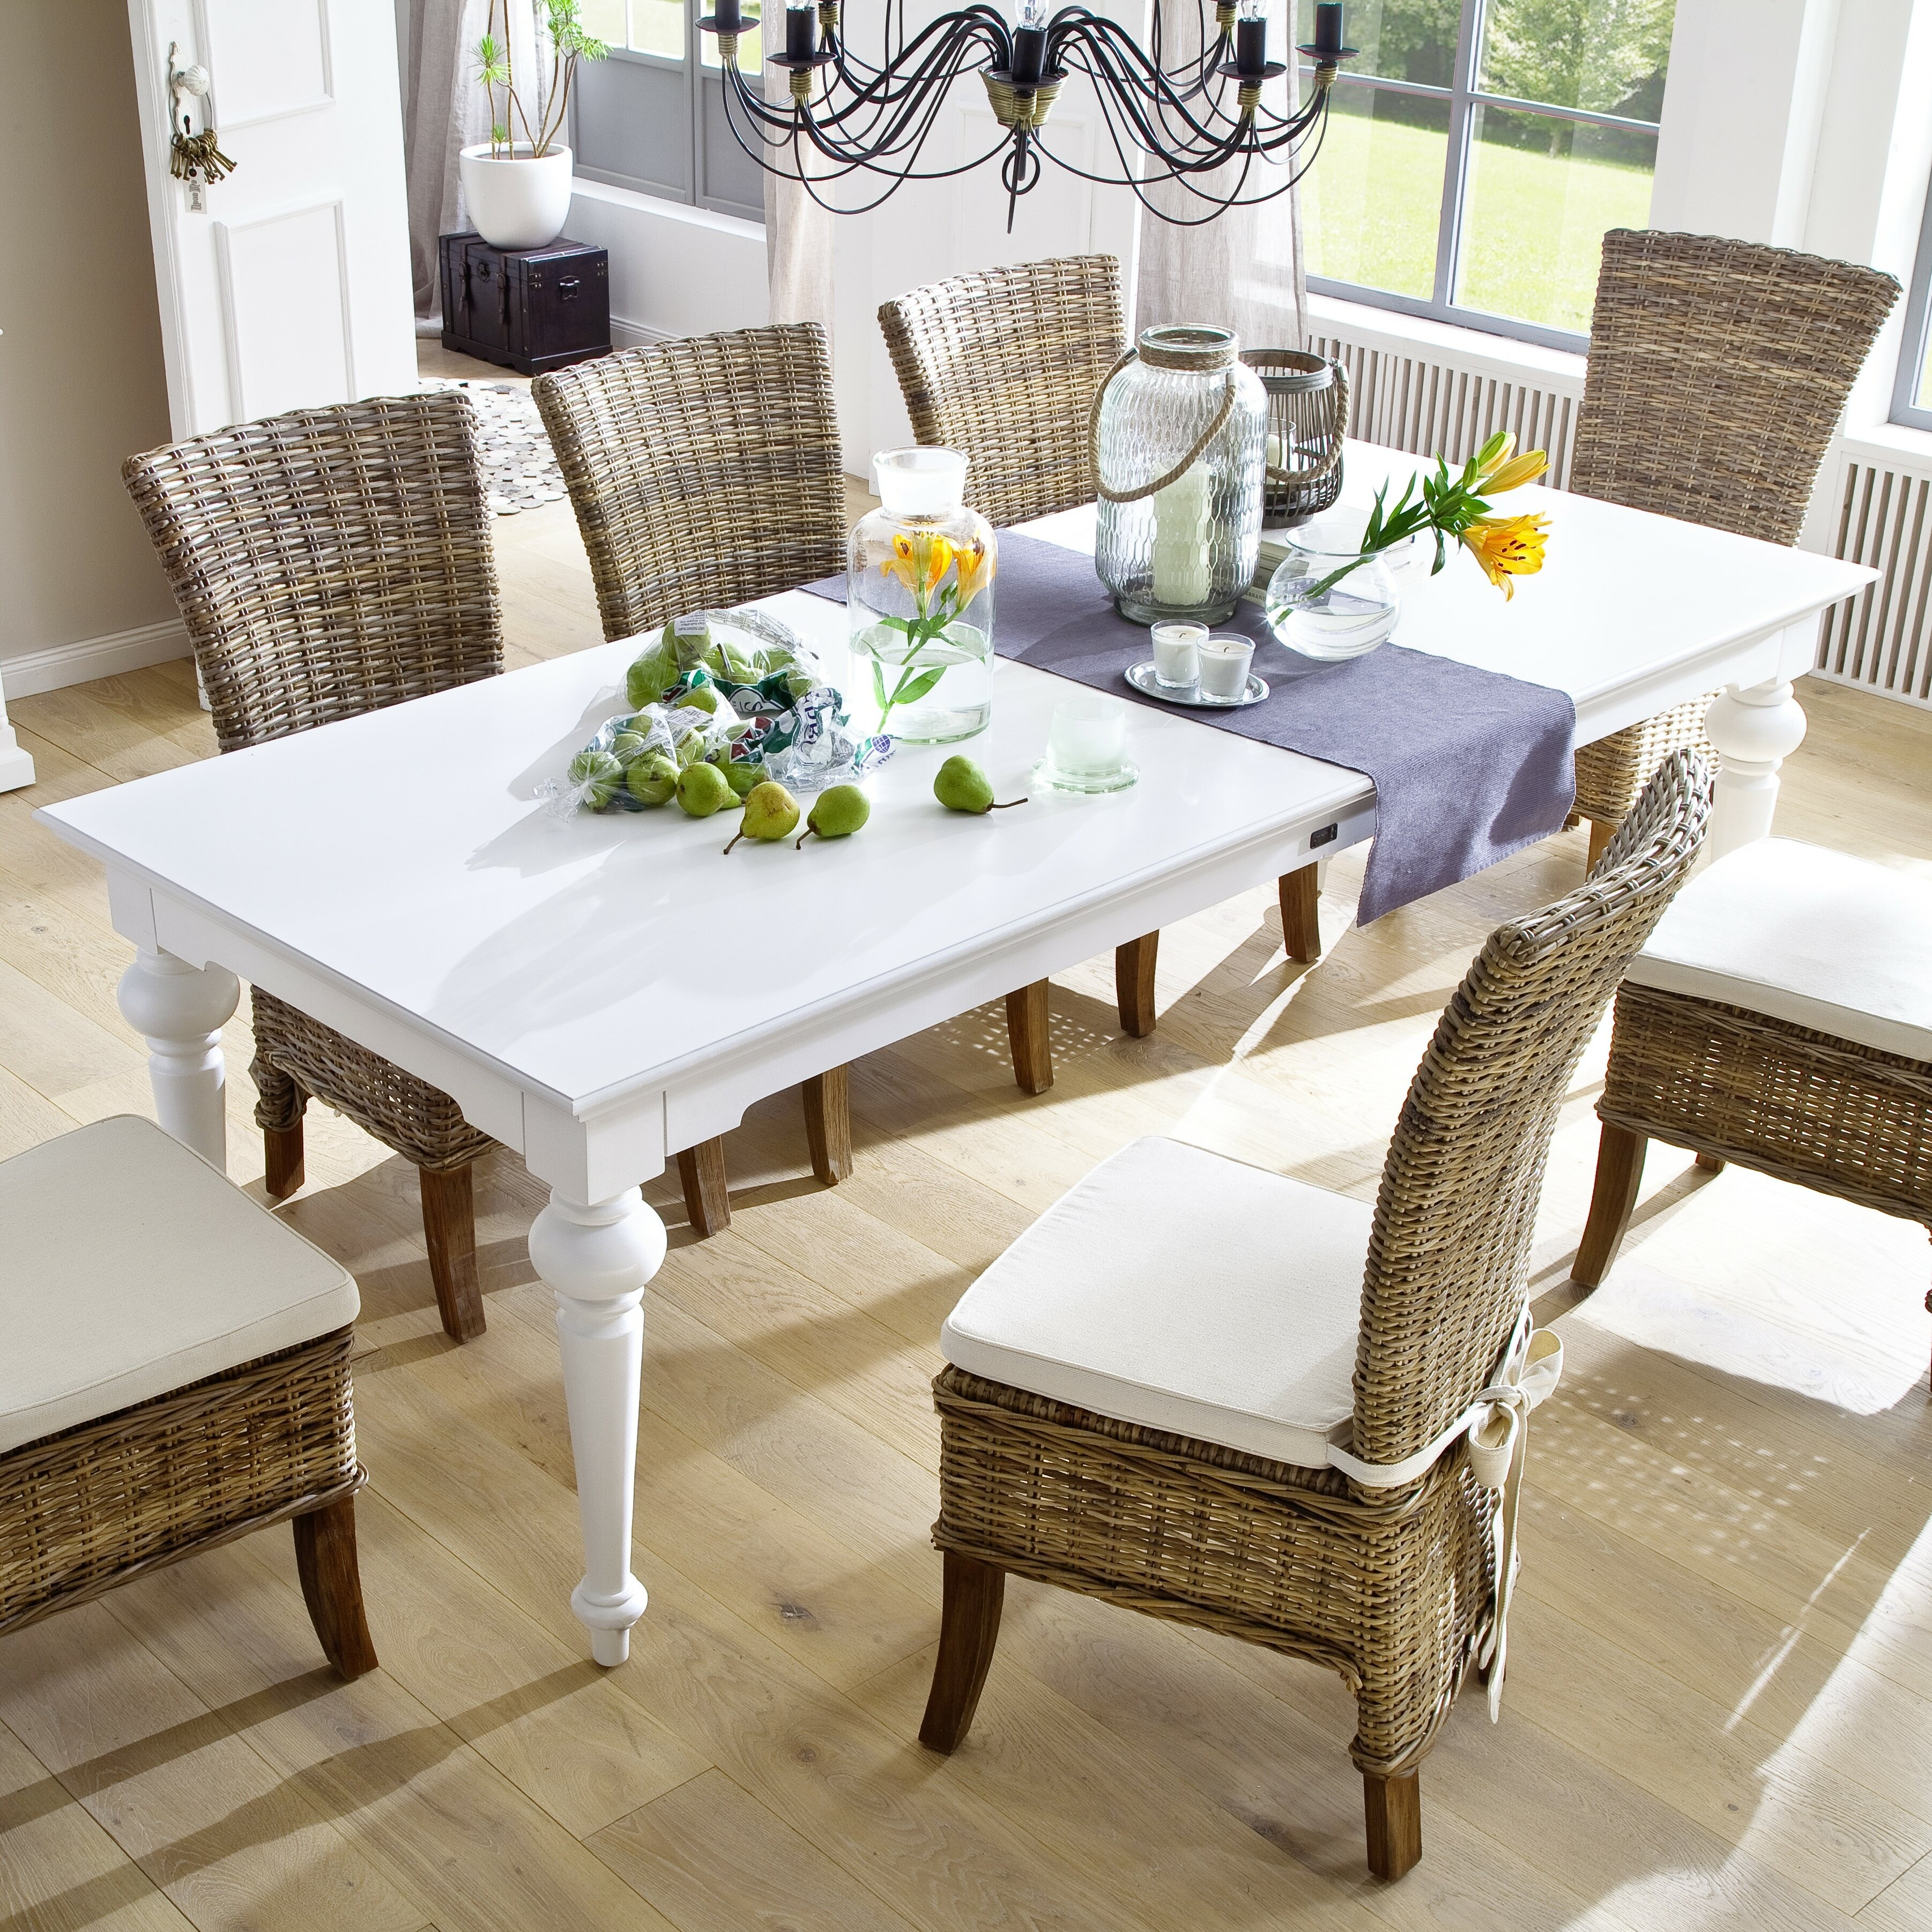 novasolo provence 94 dining table reviews wayfair. Black Bedroom Furniture Sets. Home Design Ideas